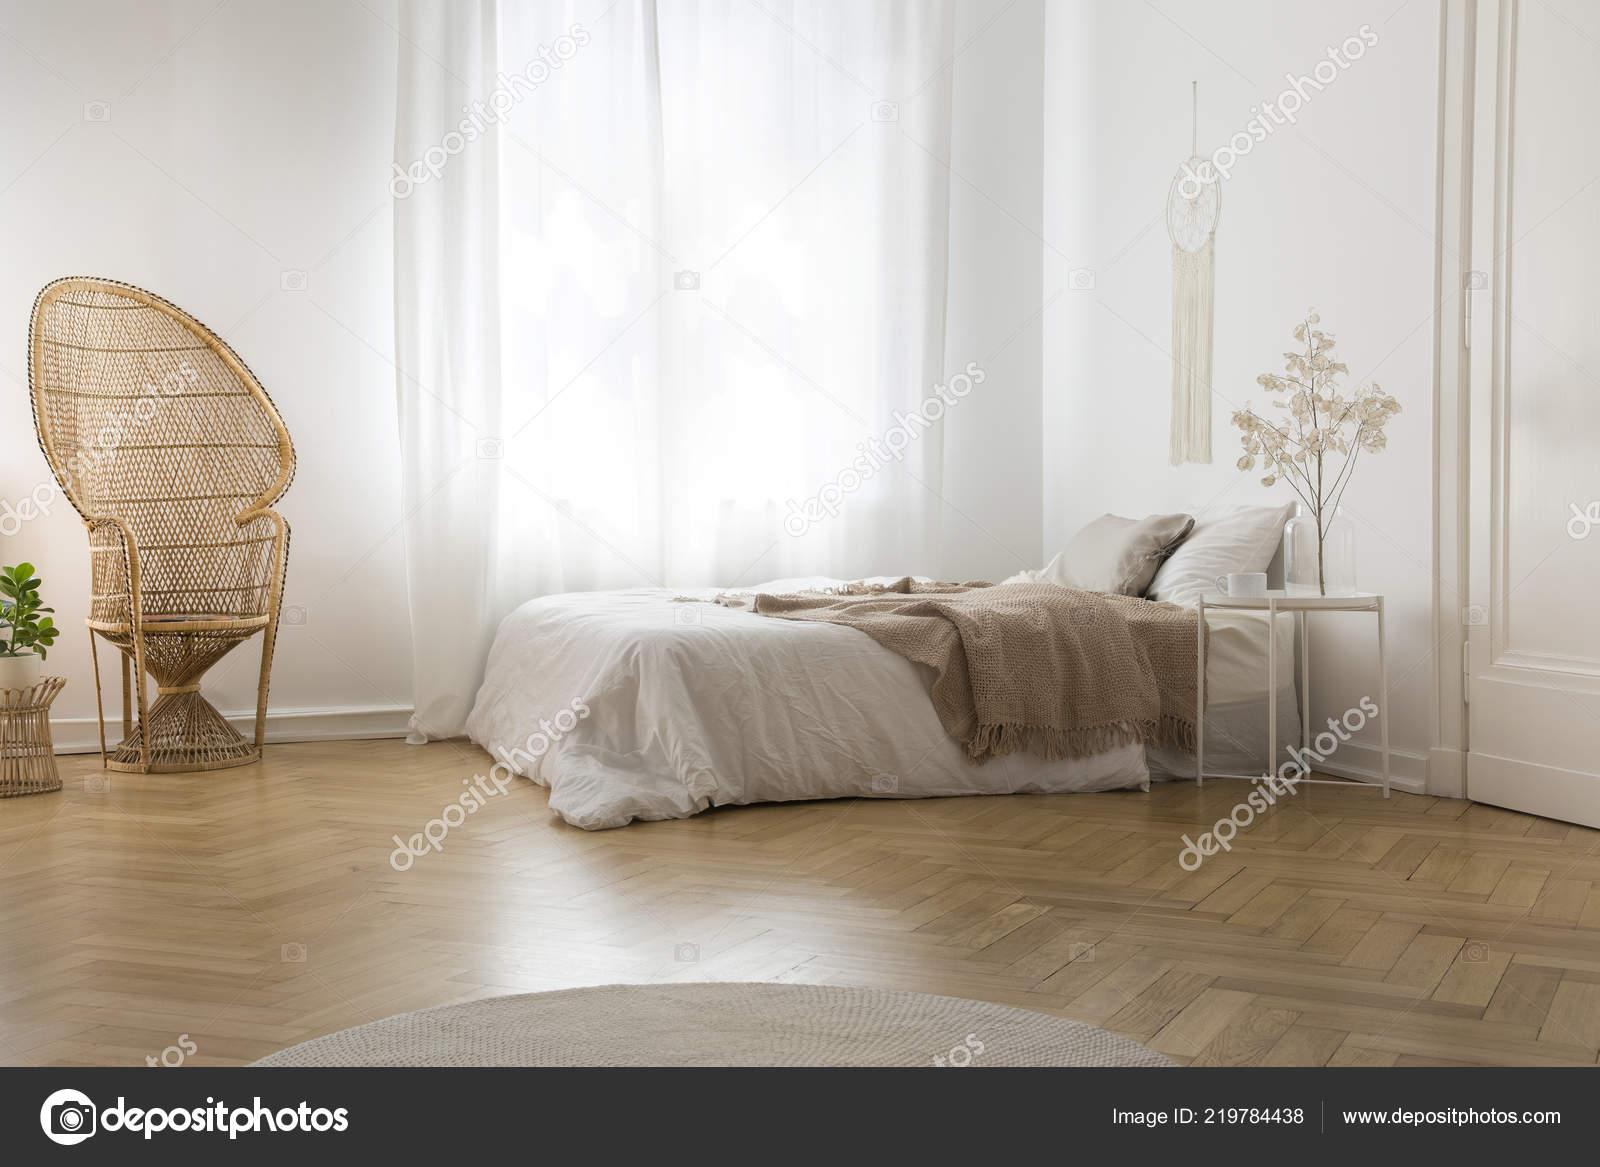 Rattan Peacock Chair Next Window White Bedroom Interior Blanket Bed